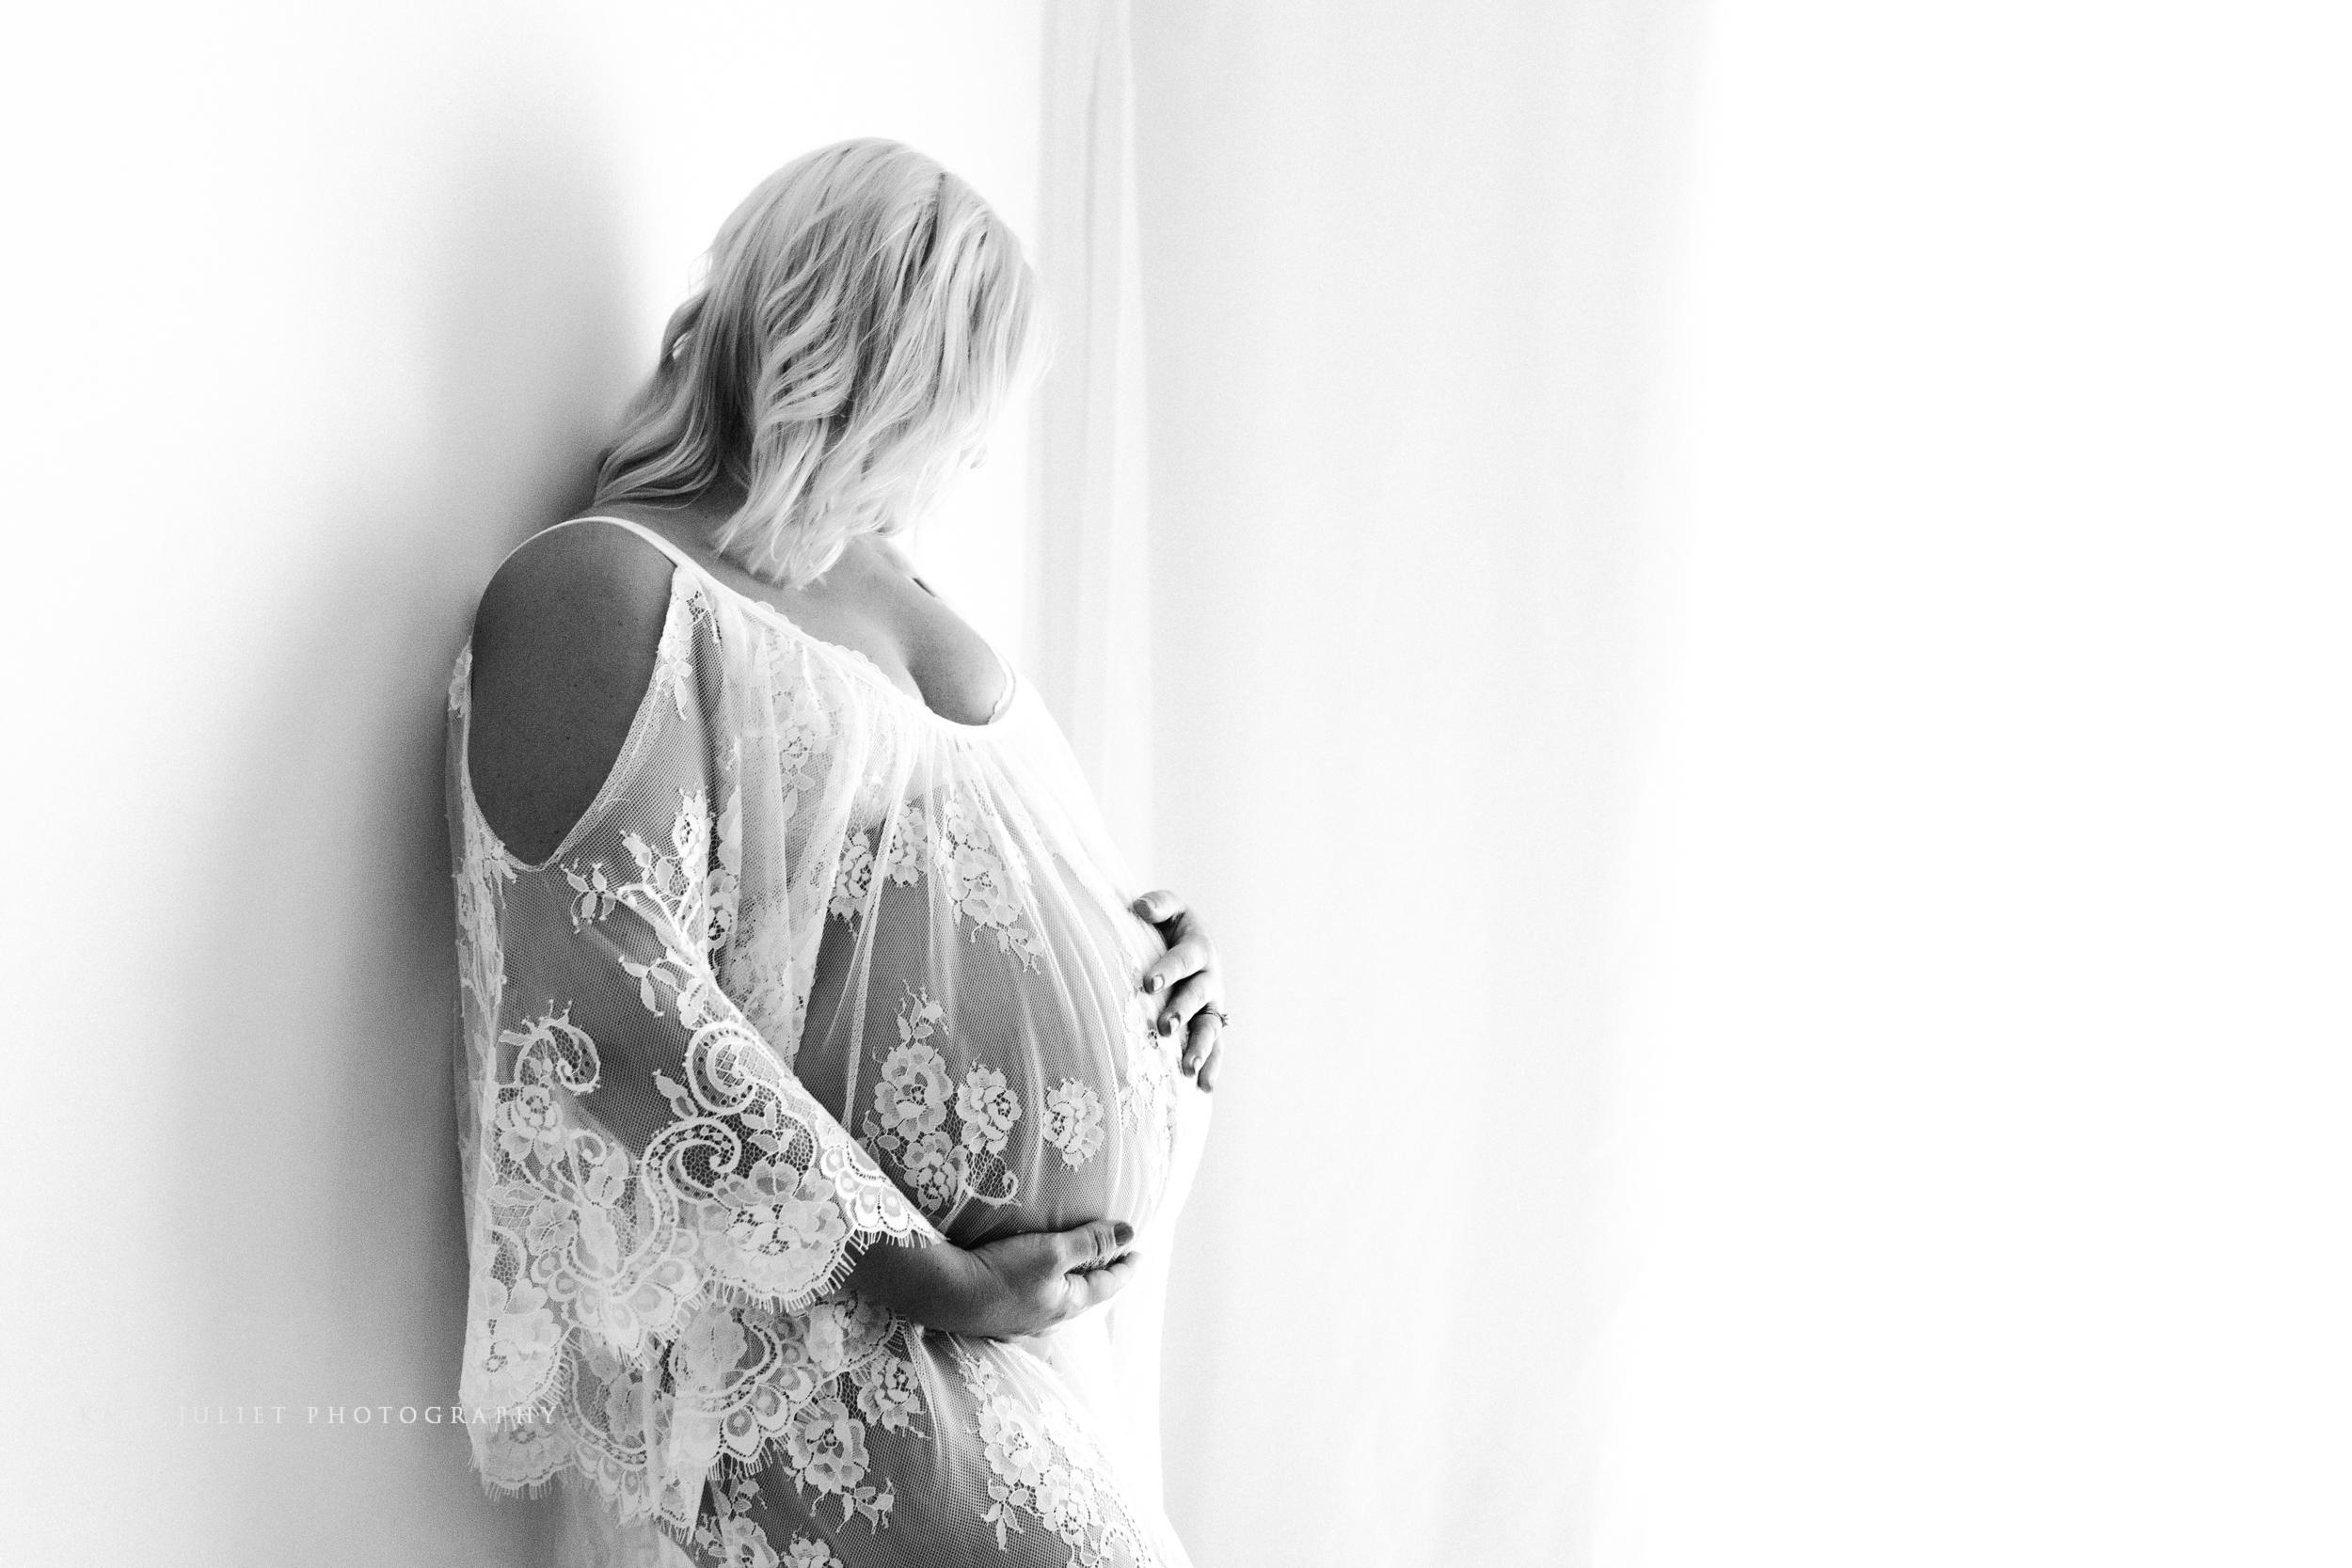 kate juliet photography - maternity - web -62.jpg